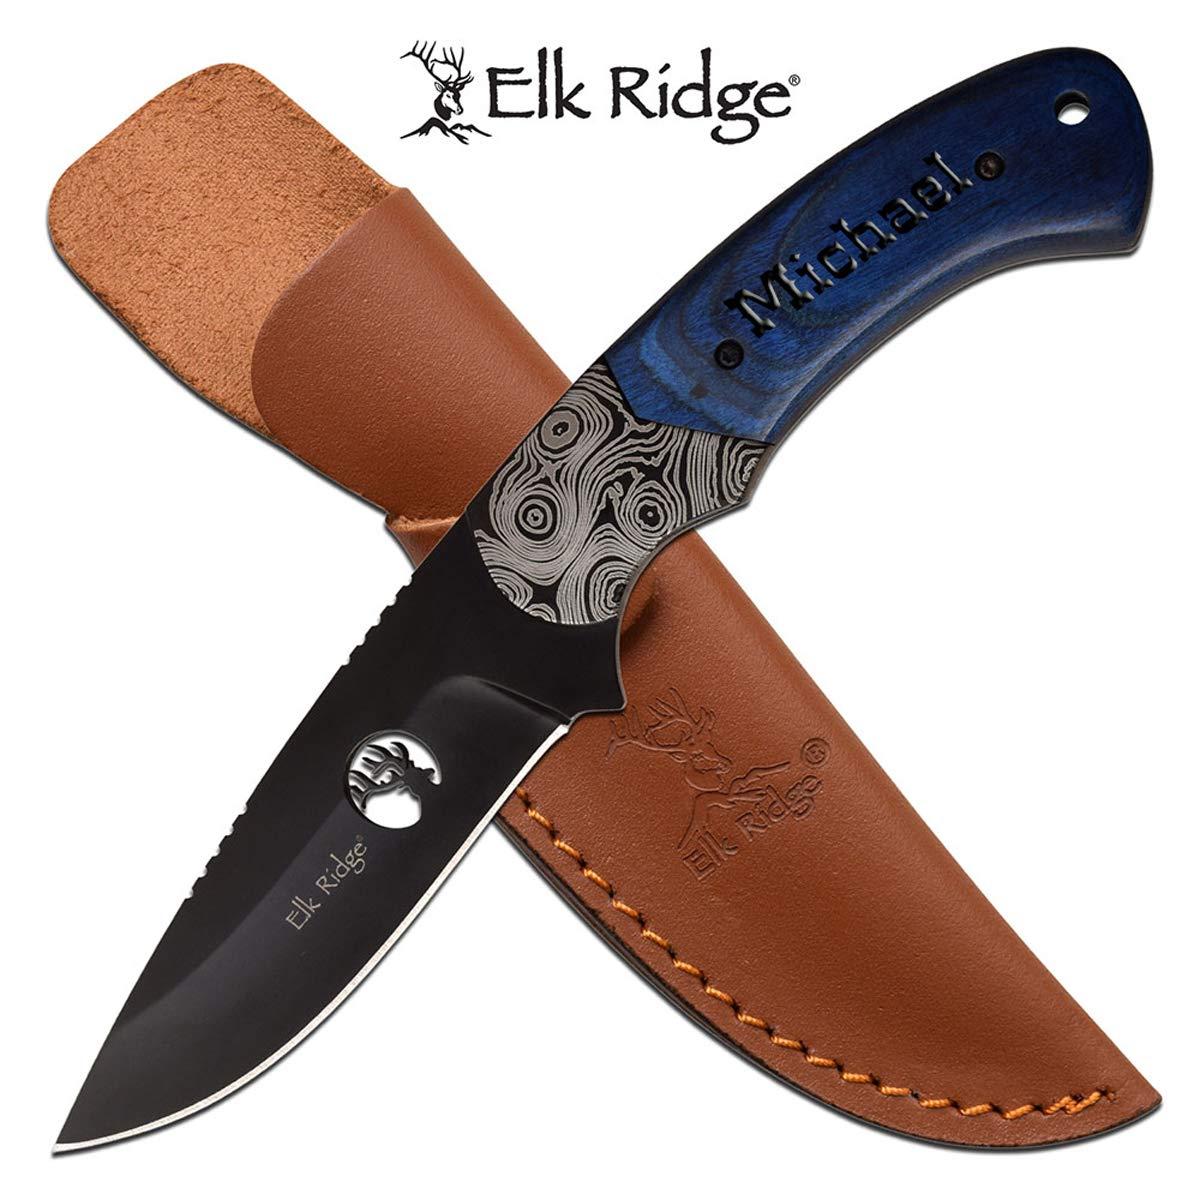 Elk Ridge Personalized ER-200-09BL Fixed Blade Knife (ER-200-09BL)